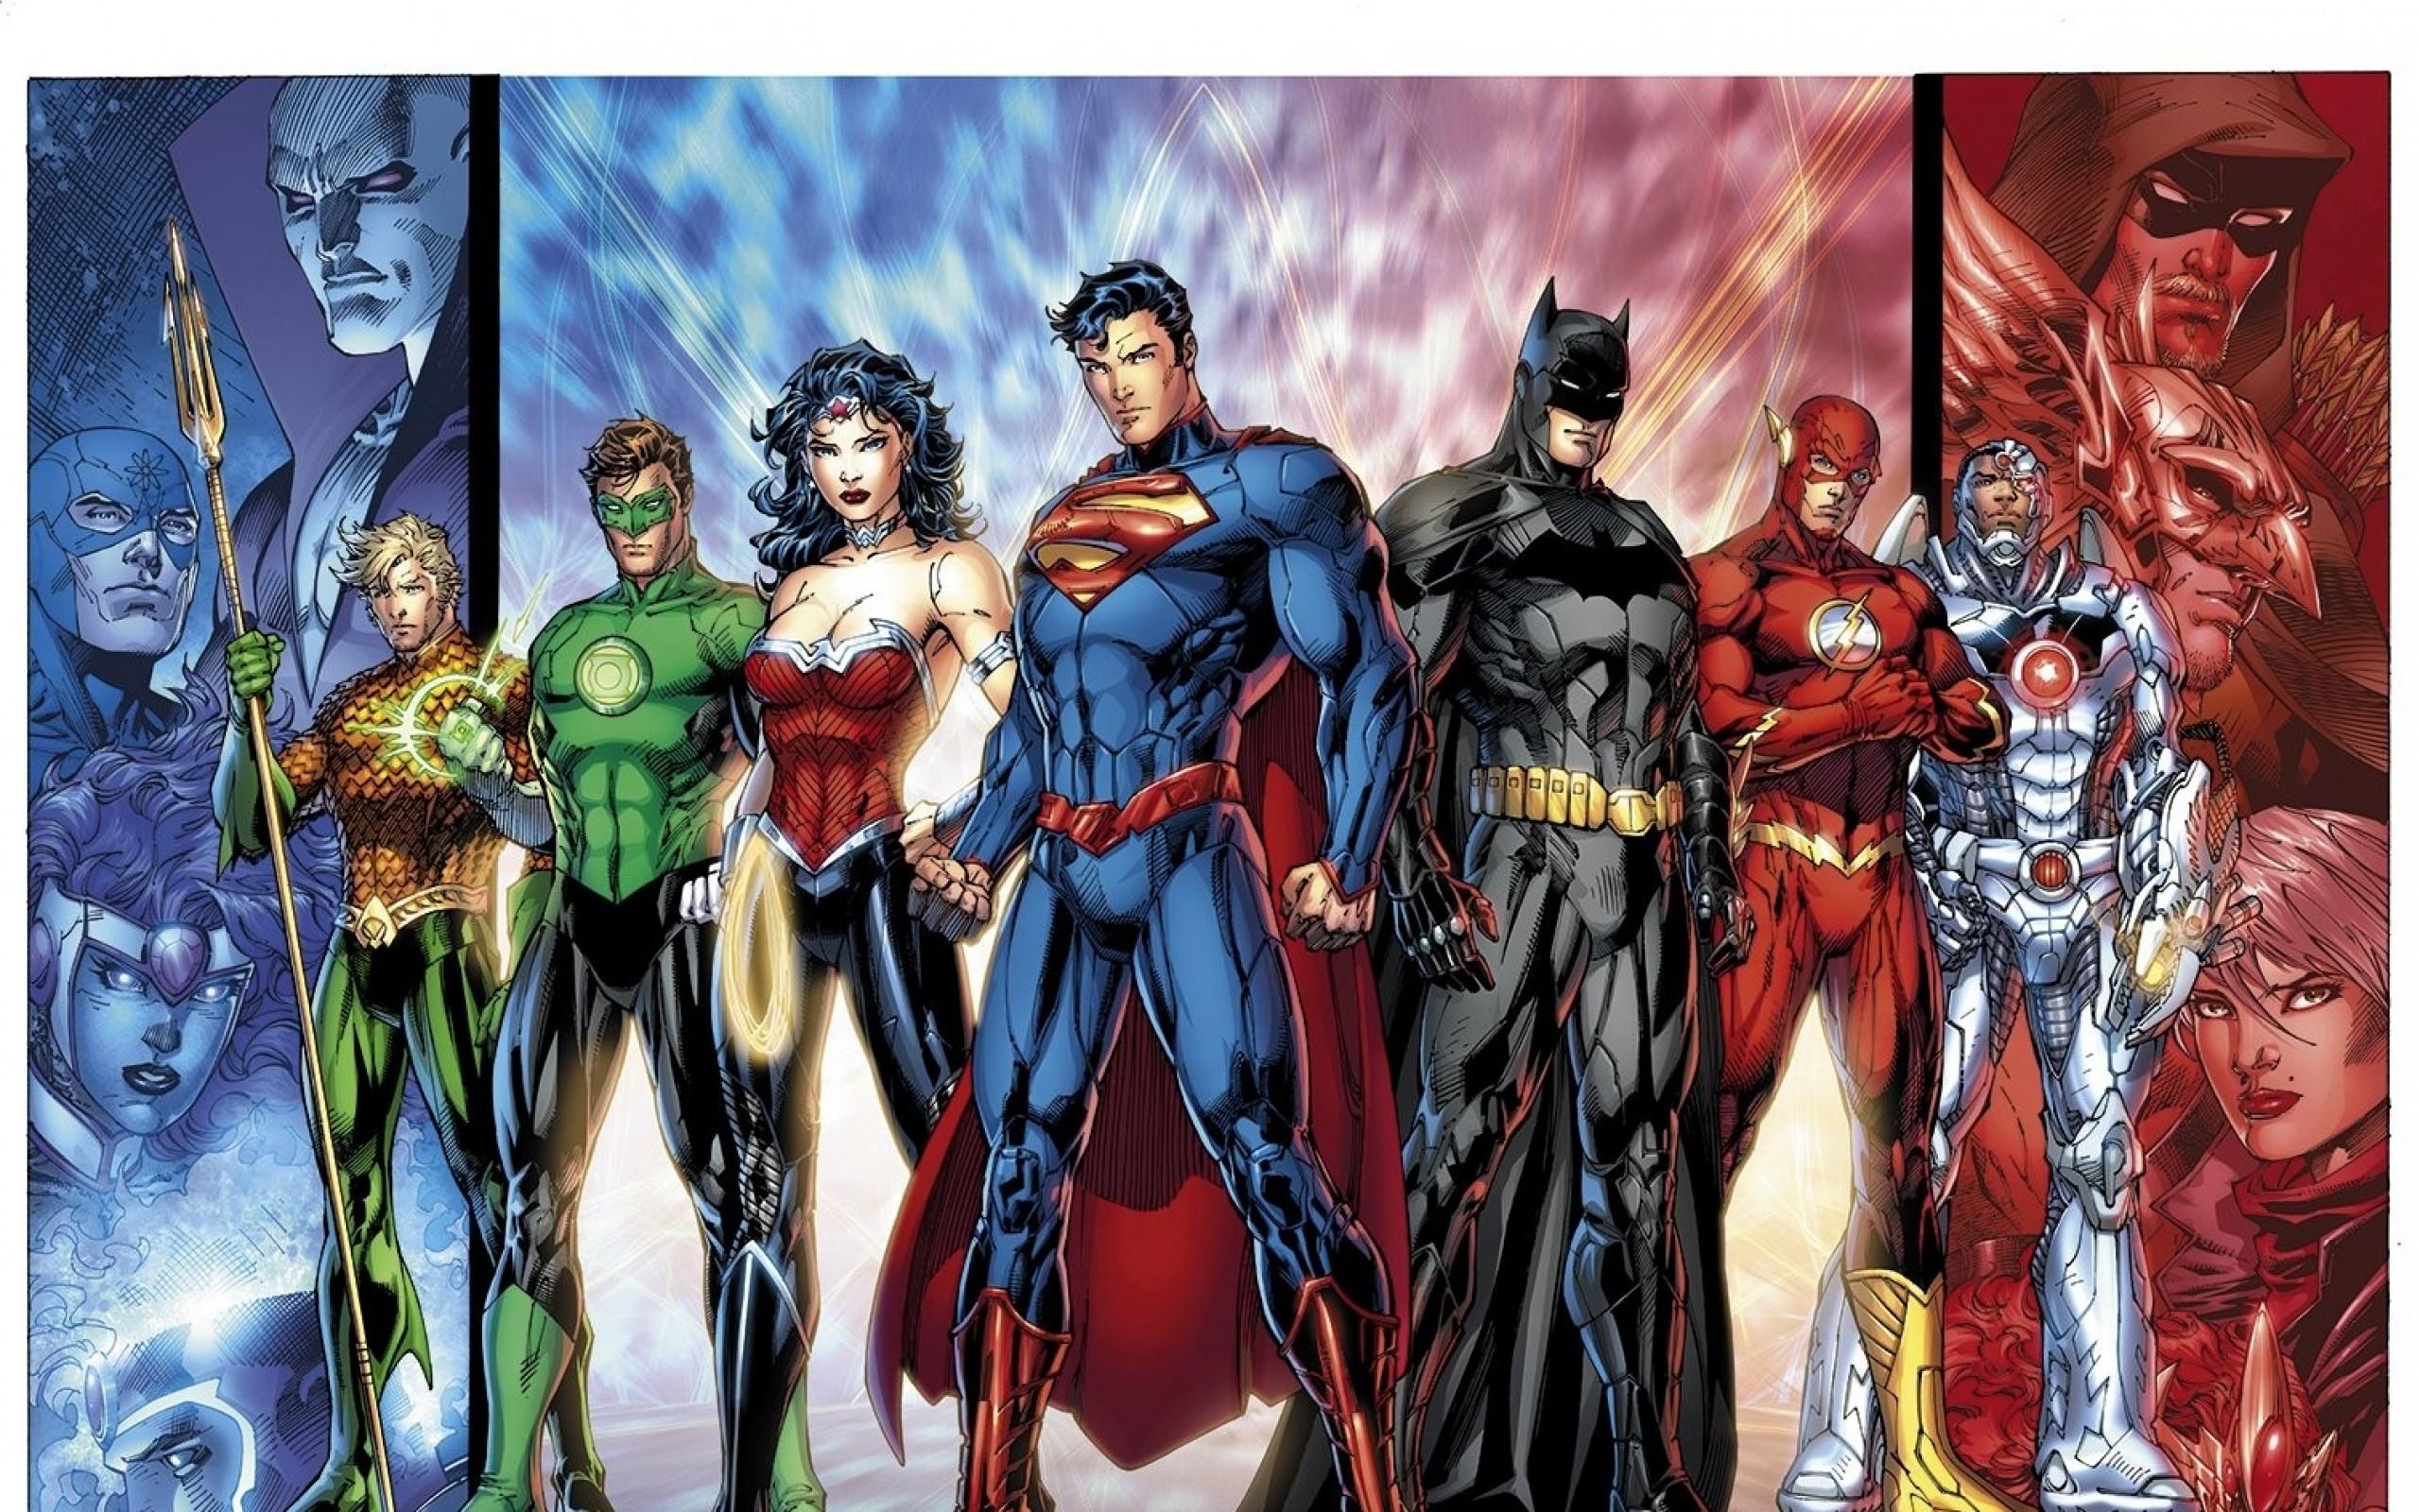 green lantern batman dc comics superman superheroes justice league aquaman jim  lee flash comic hero Art